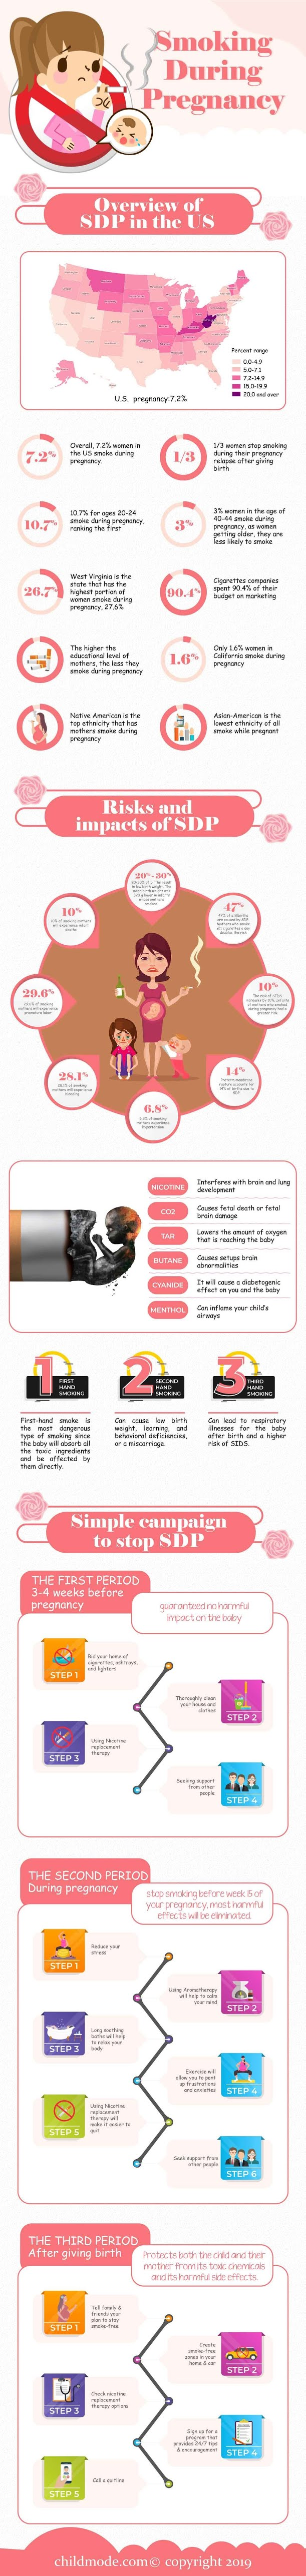 Smoking During Pregnancy (SDP) – 2019 #infographic